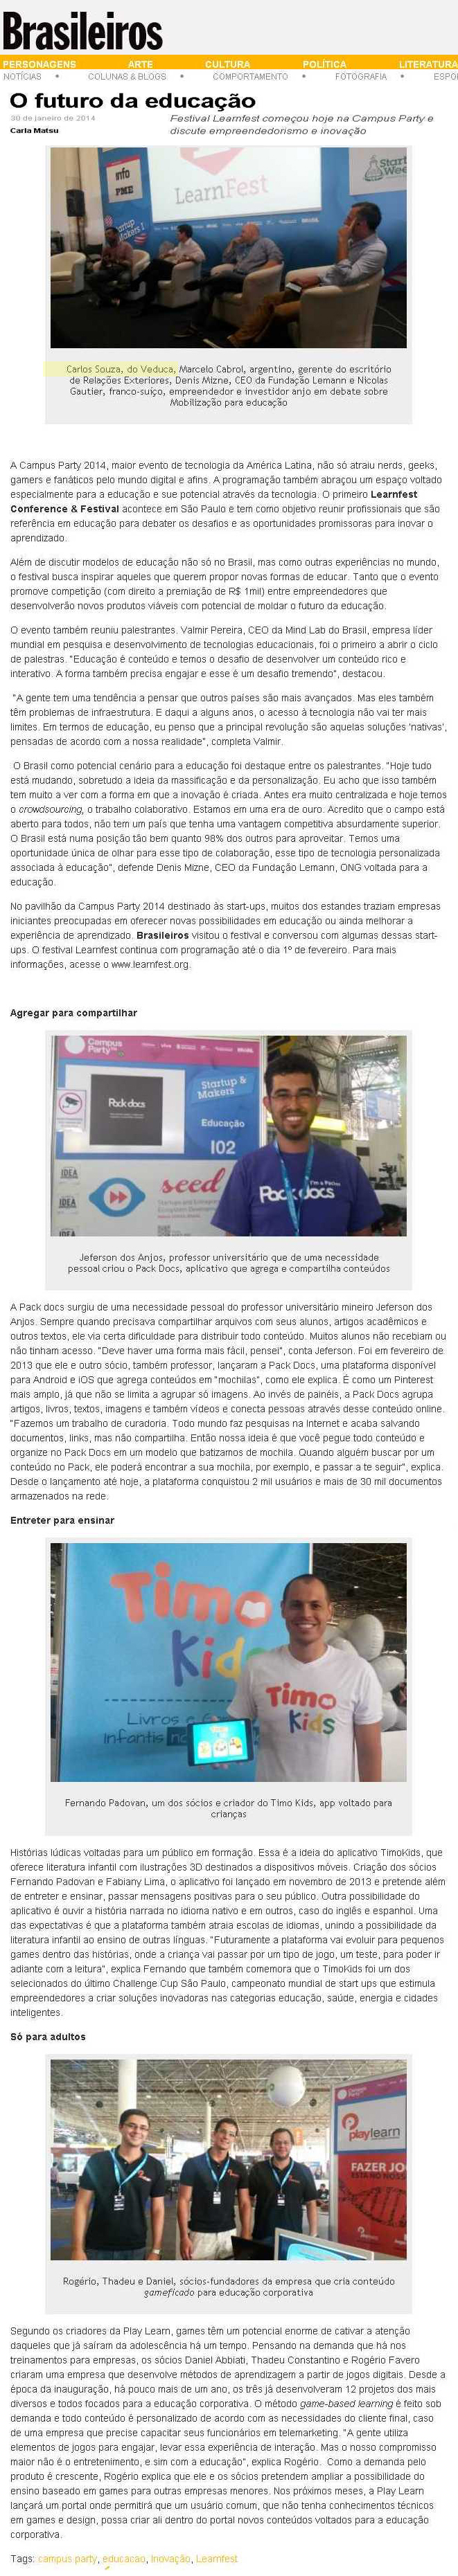 30.01.14-Revista Brasileiros-Veduca (1).jpeg